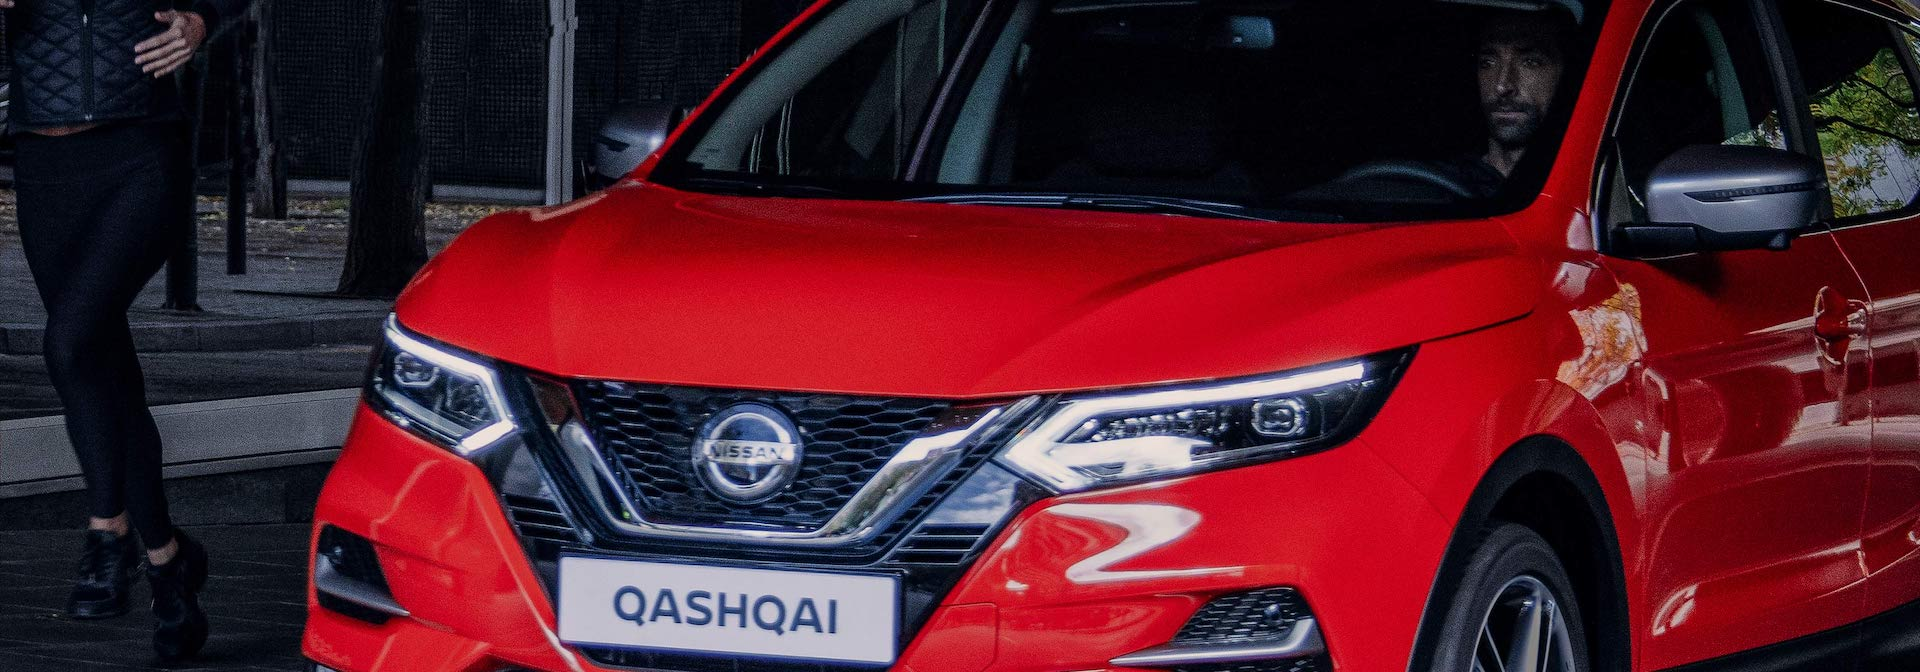 Nissan Qashqai em Almada